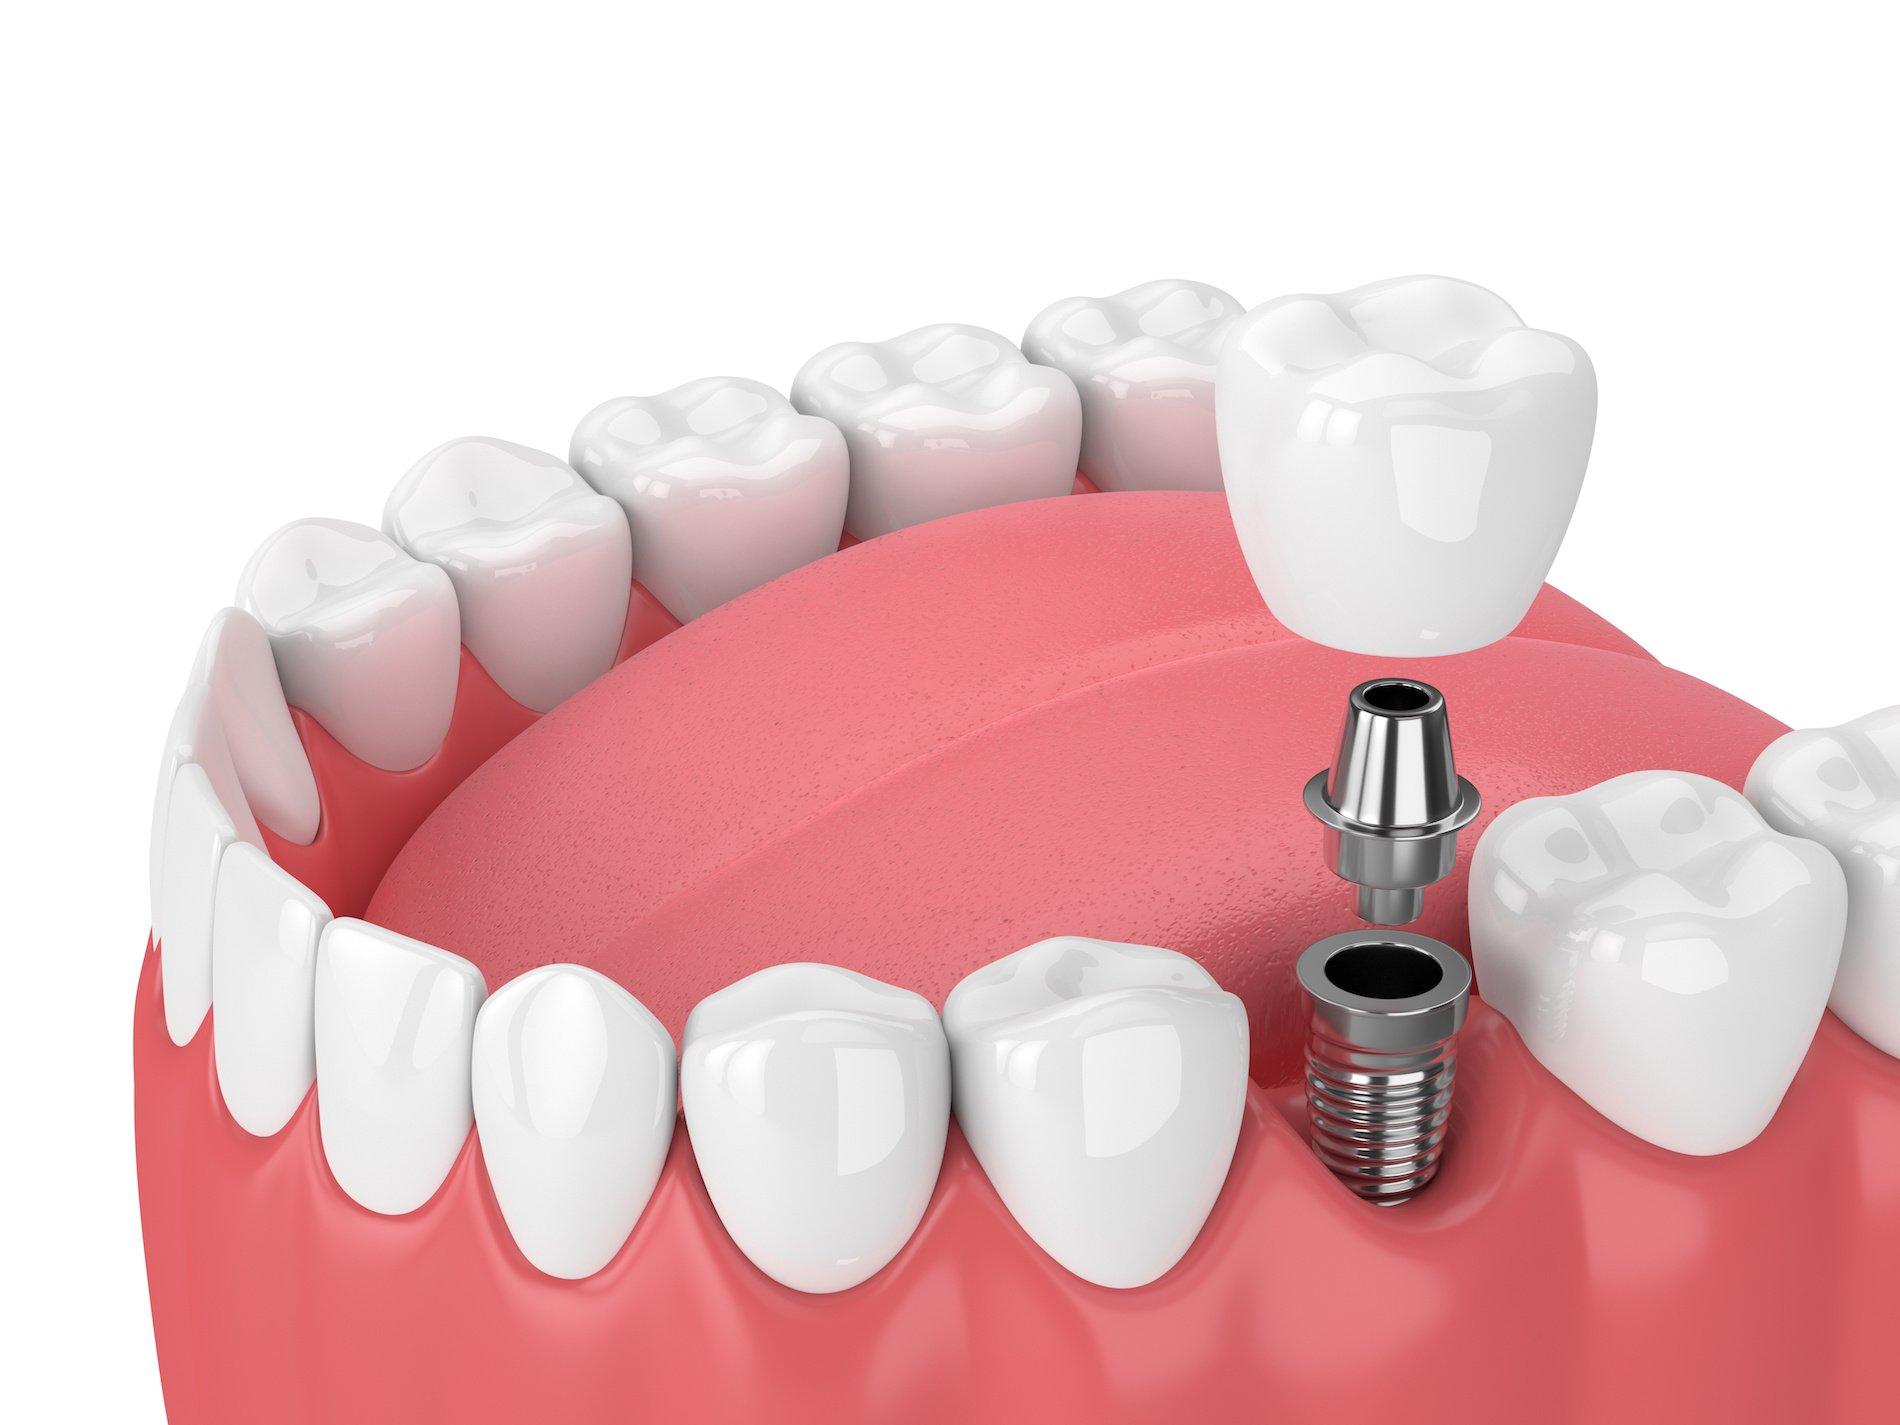 What Are Dental Implants PRECiDENT Center for Dental Medicine